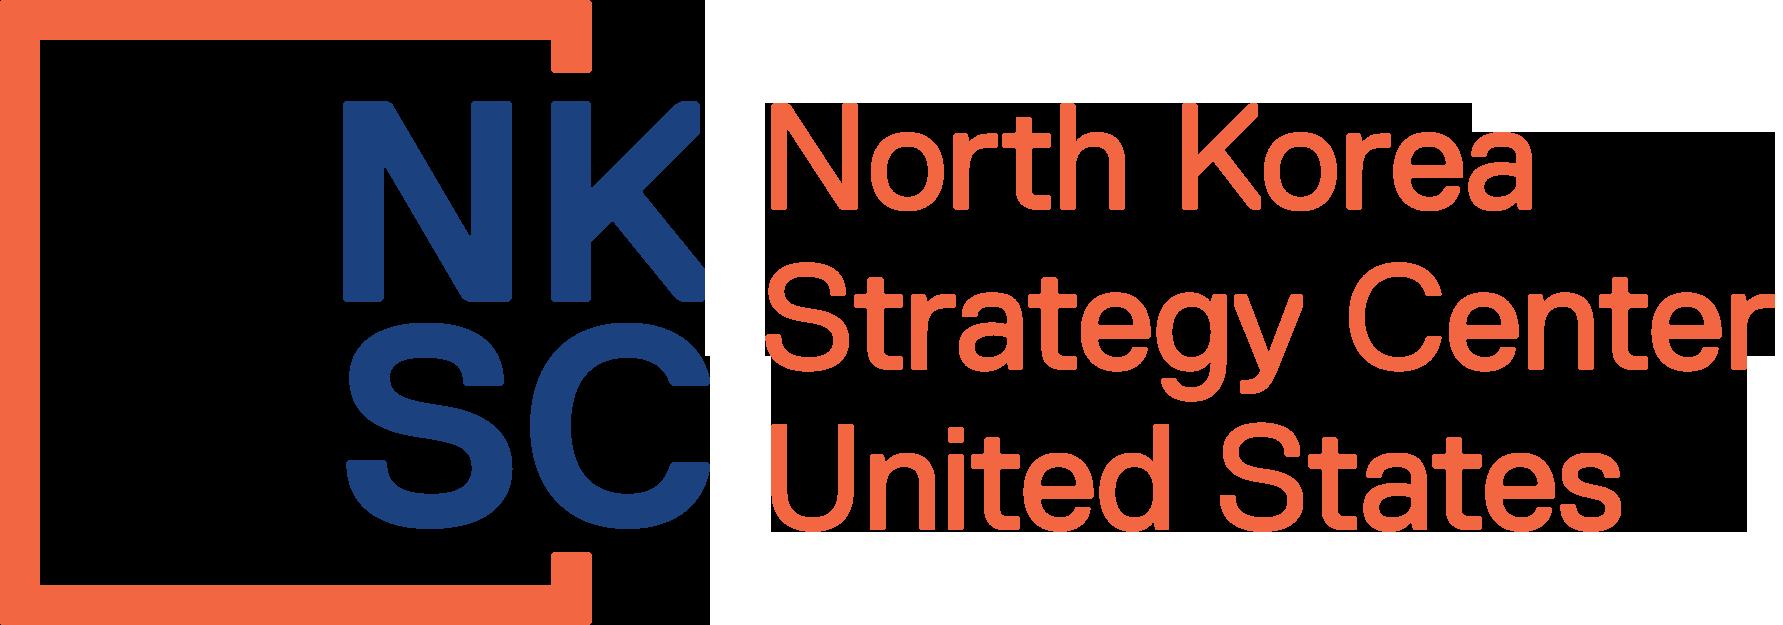 nksc_us_logo_letterhead.png